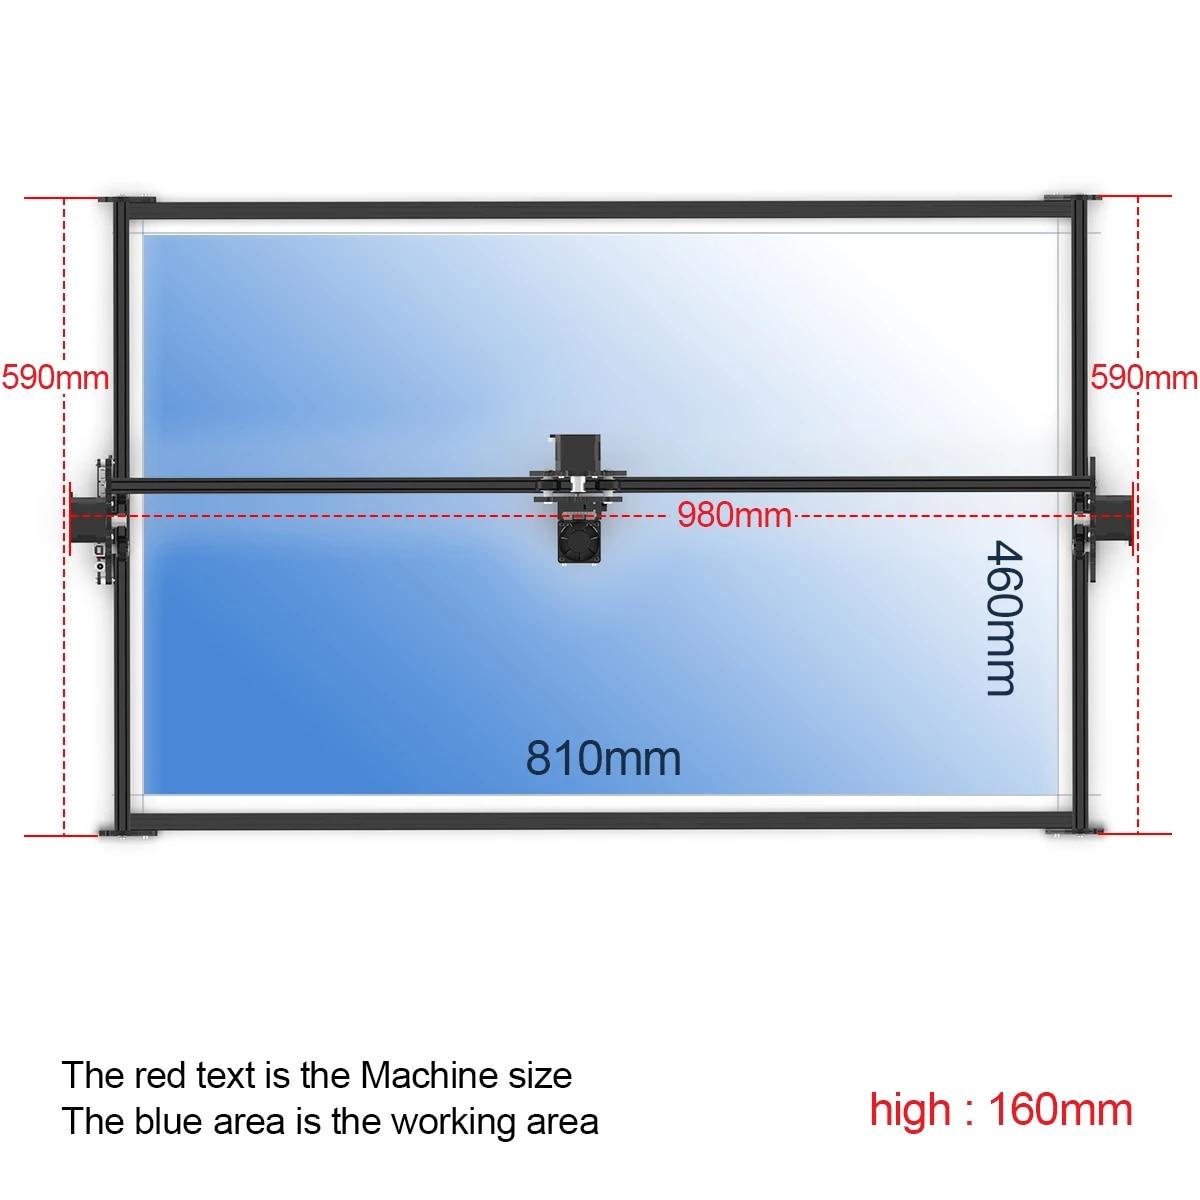 NEJE N40630 Master 2s Max 40W CNC Laser Engraver Wood Cutting Engraving Machine with Bluetooth APP Control LaserGRBL Lightburn enlarge